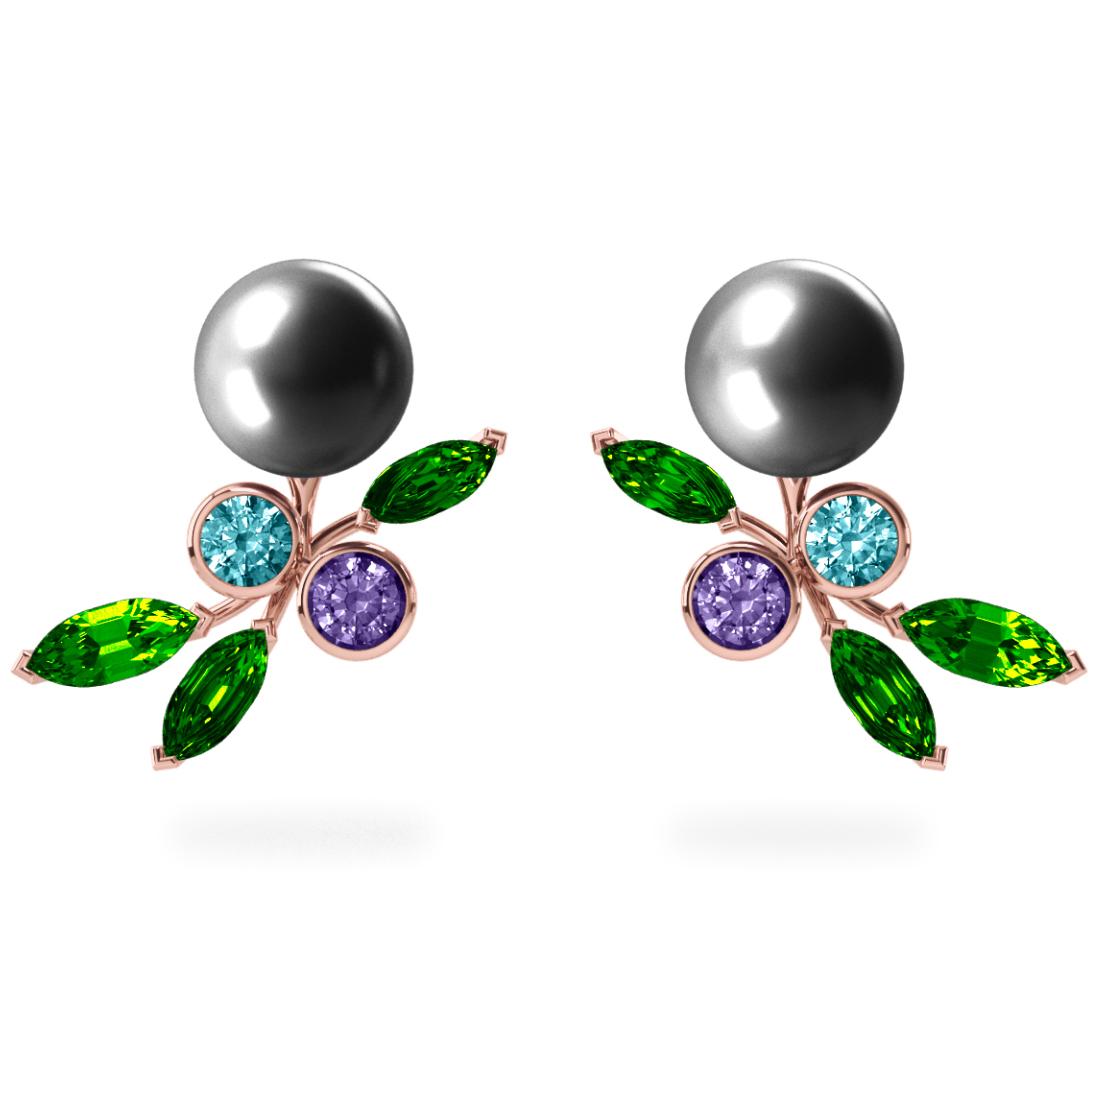 Boucles d'oreilles My Angel Grise - Saphirs, diamants, tsavorites & perles de Tahiti <br /> Or blanc 18 carats